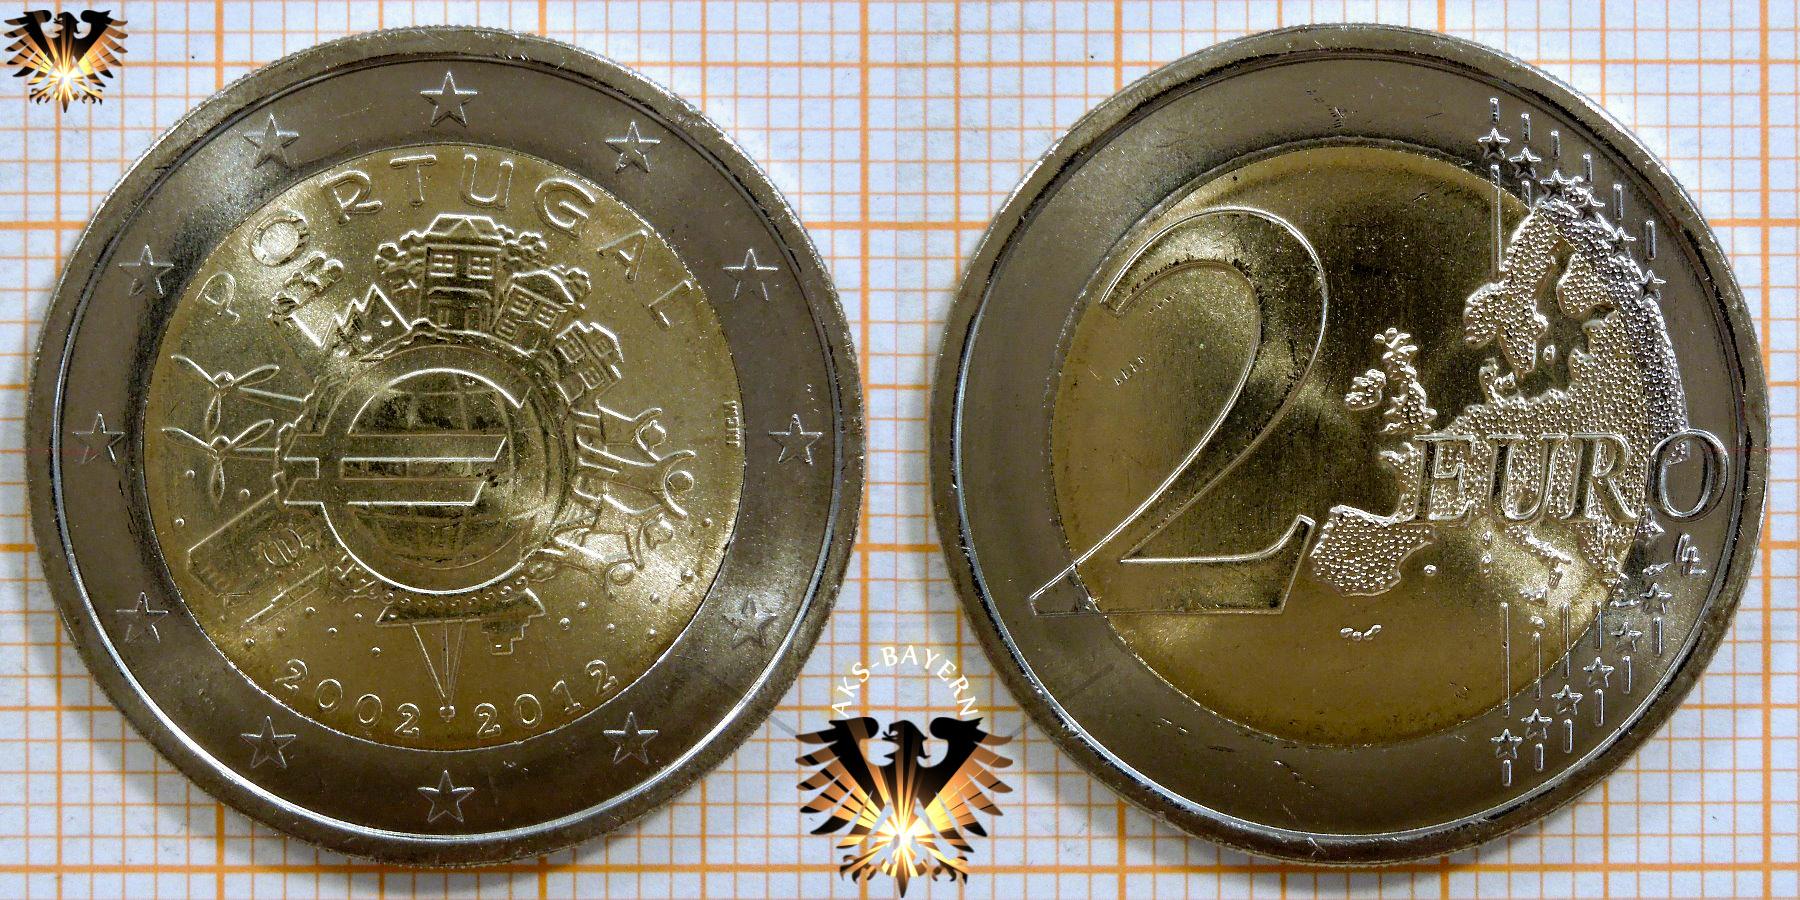 2 Euro Portugal 2012 Nominal Sammlermünze 10 Jahre Euro